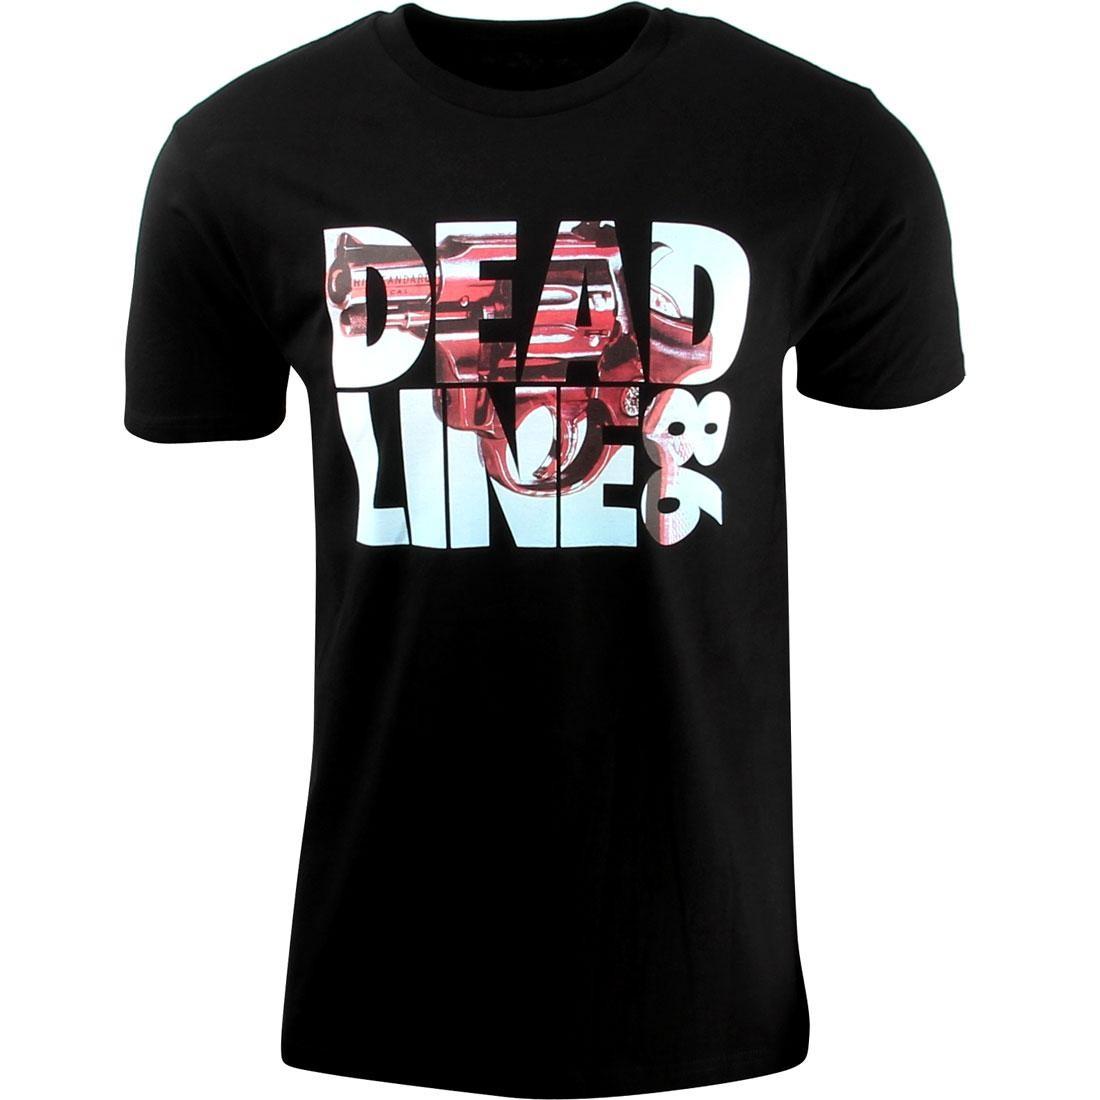 Tシャツ 黒 ブラック 【 BLACK DEADLINE 86 TEE 】 メンズファッション トップス Tシャツ カットソー